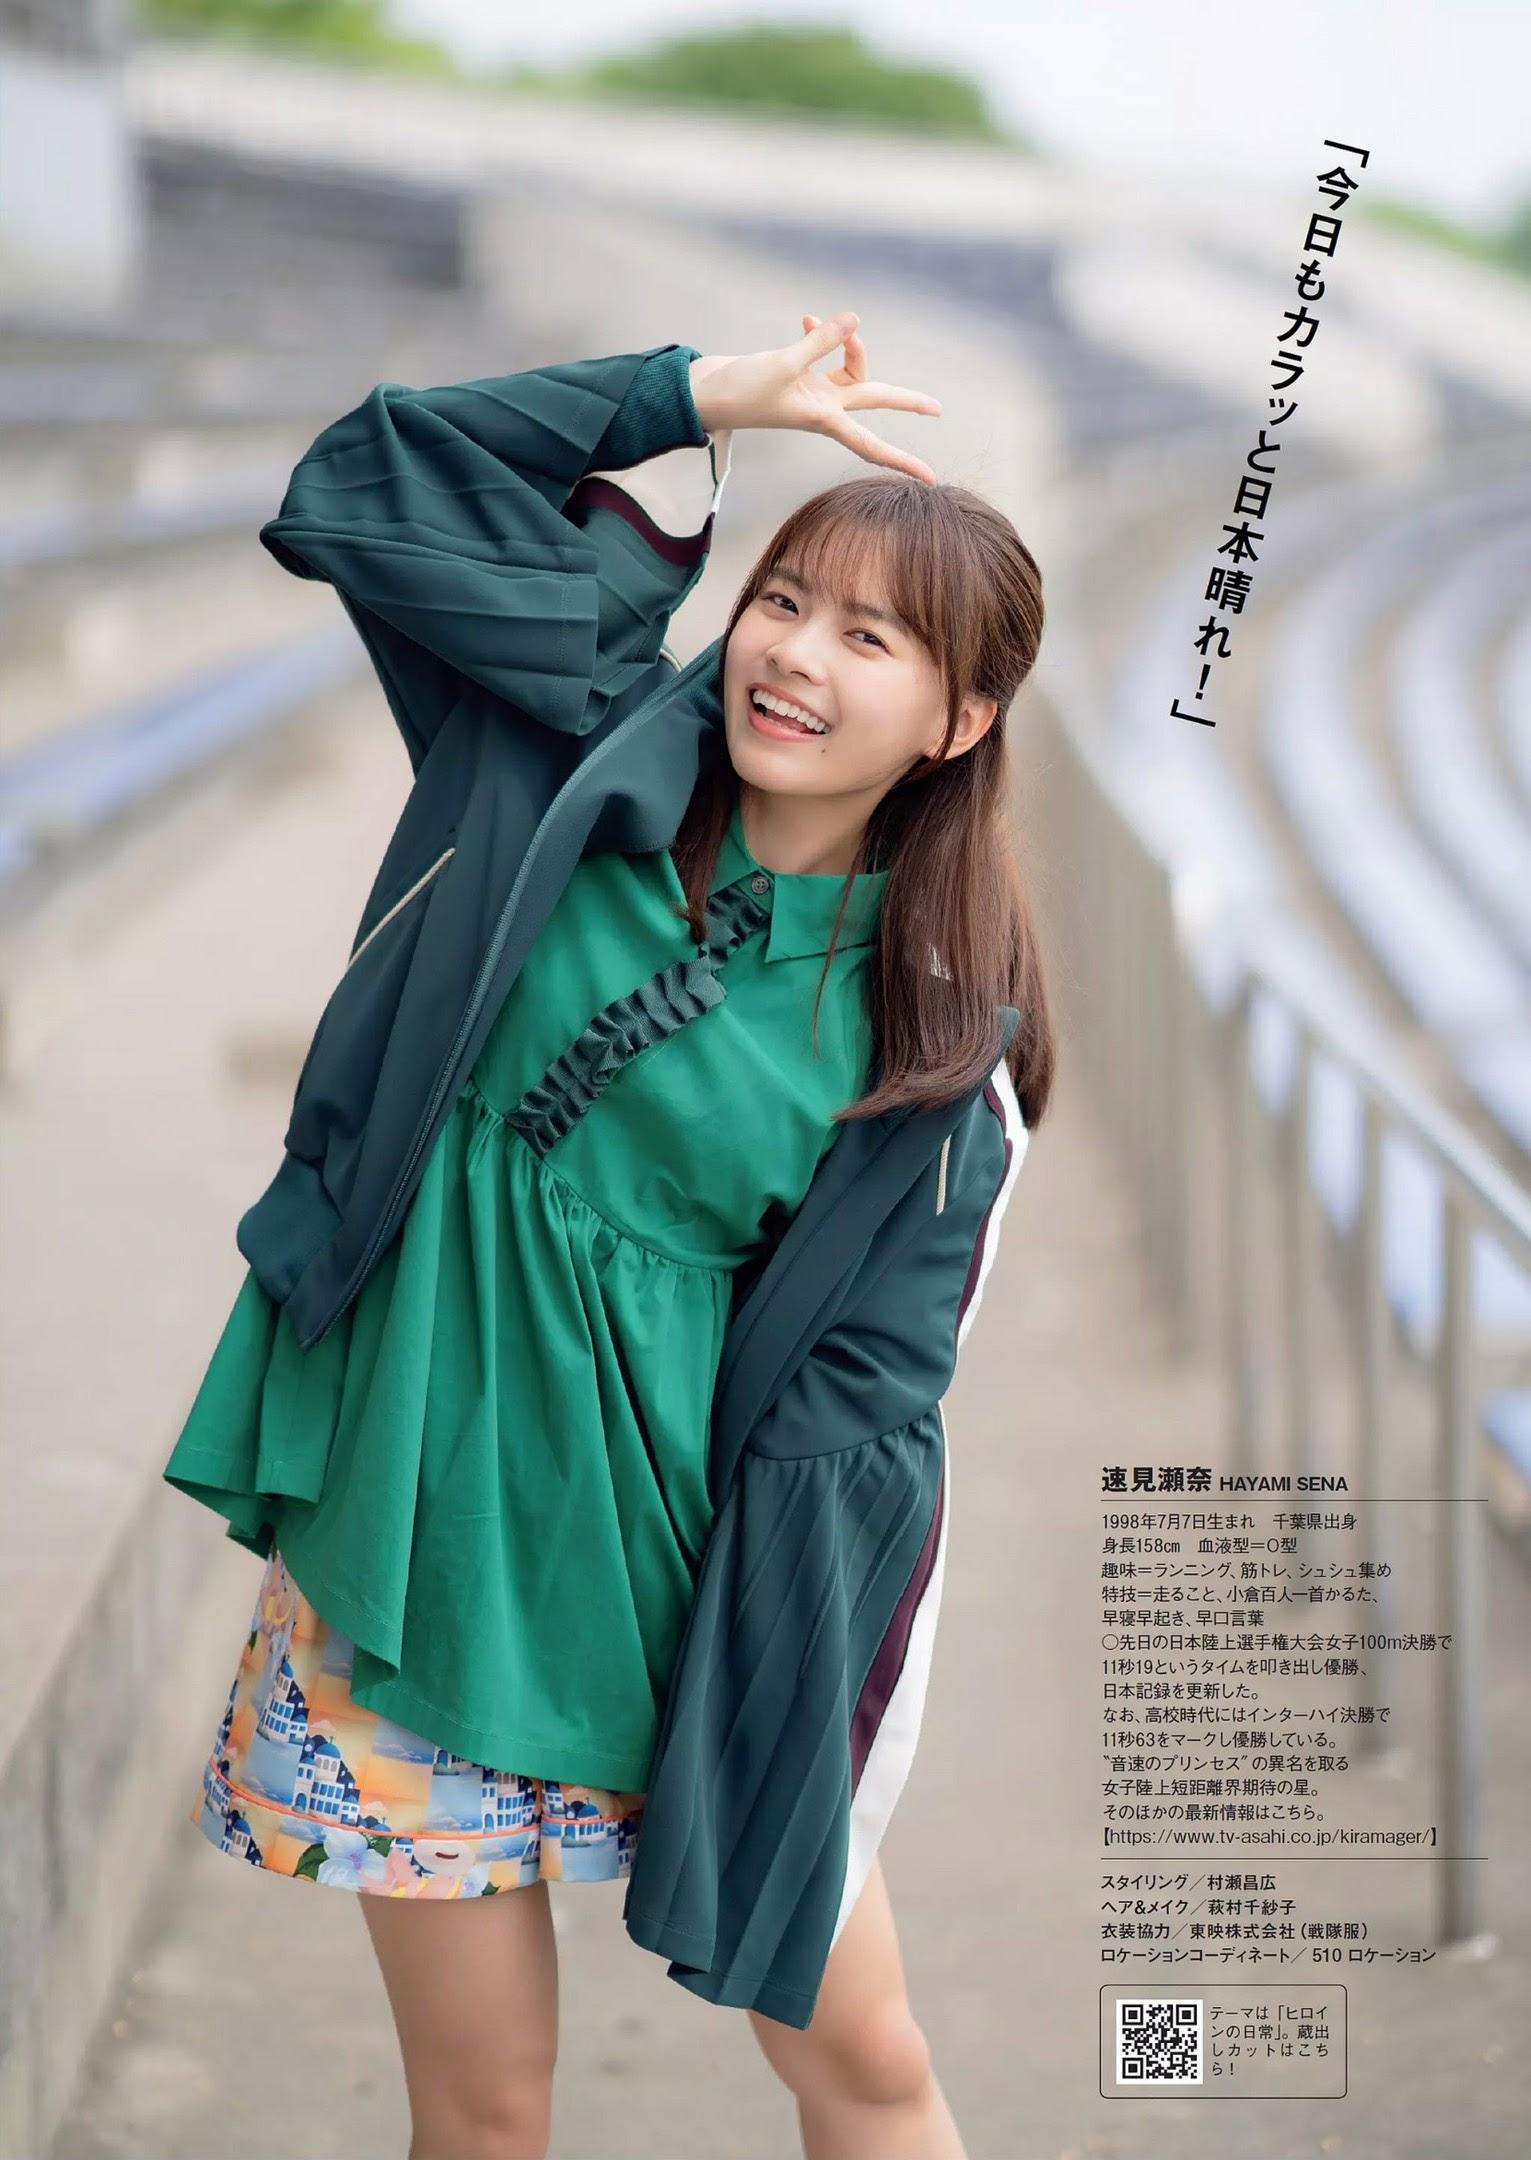 HAYAMI SENA003